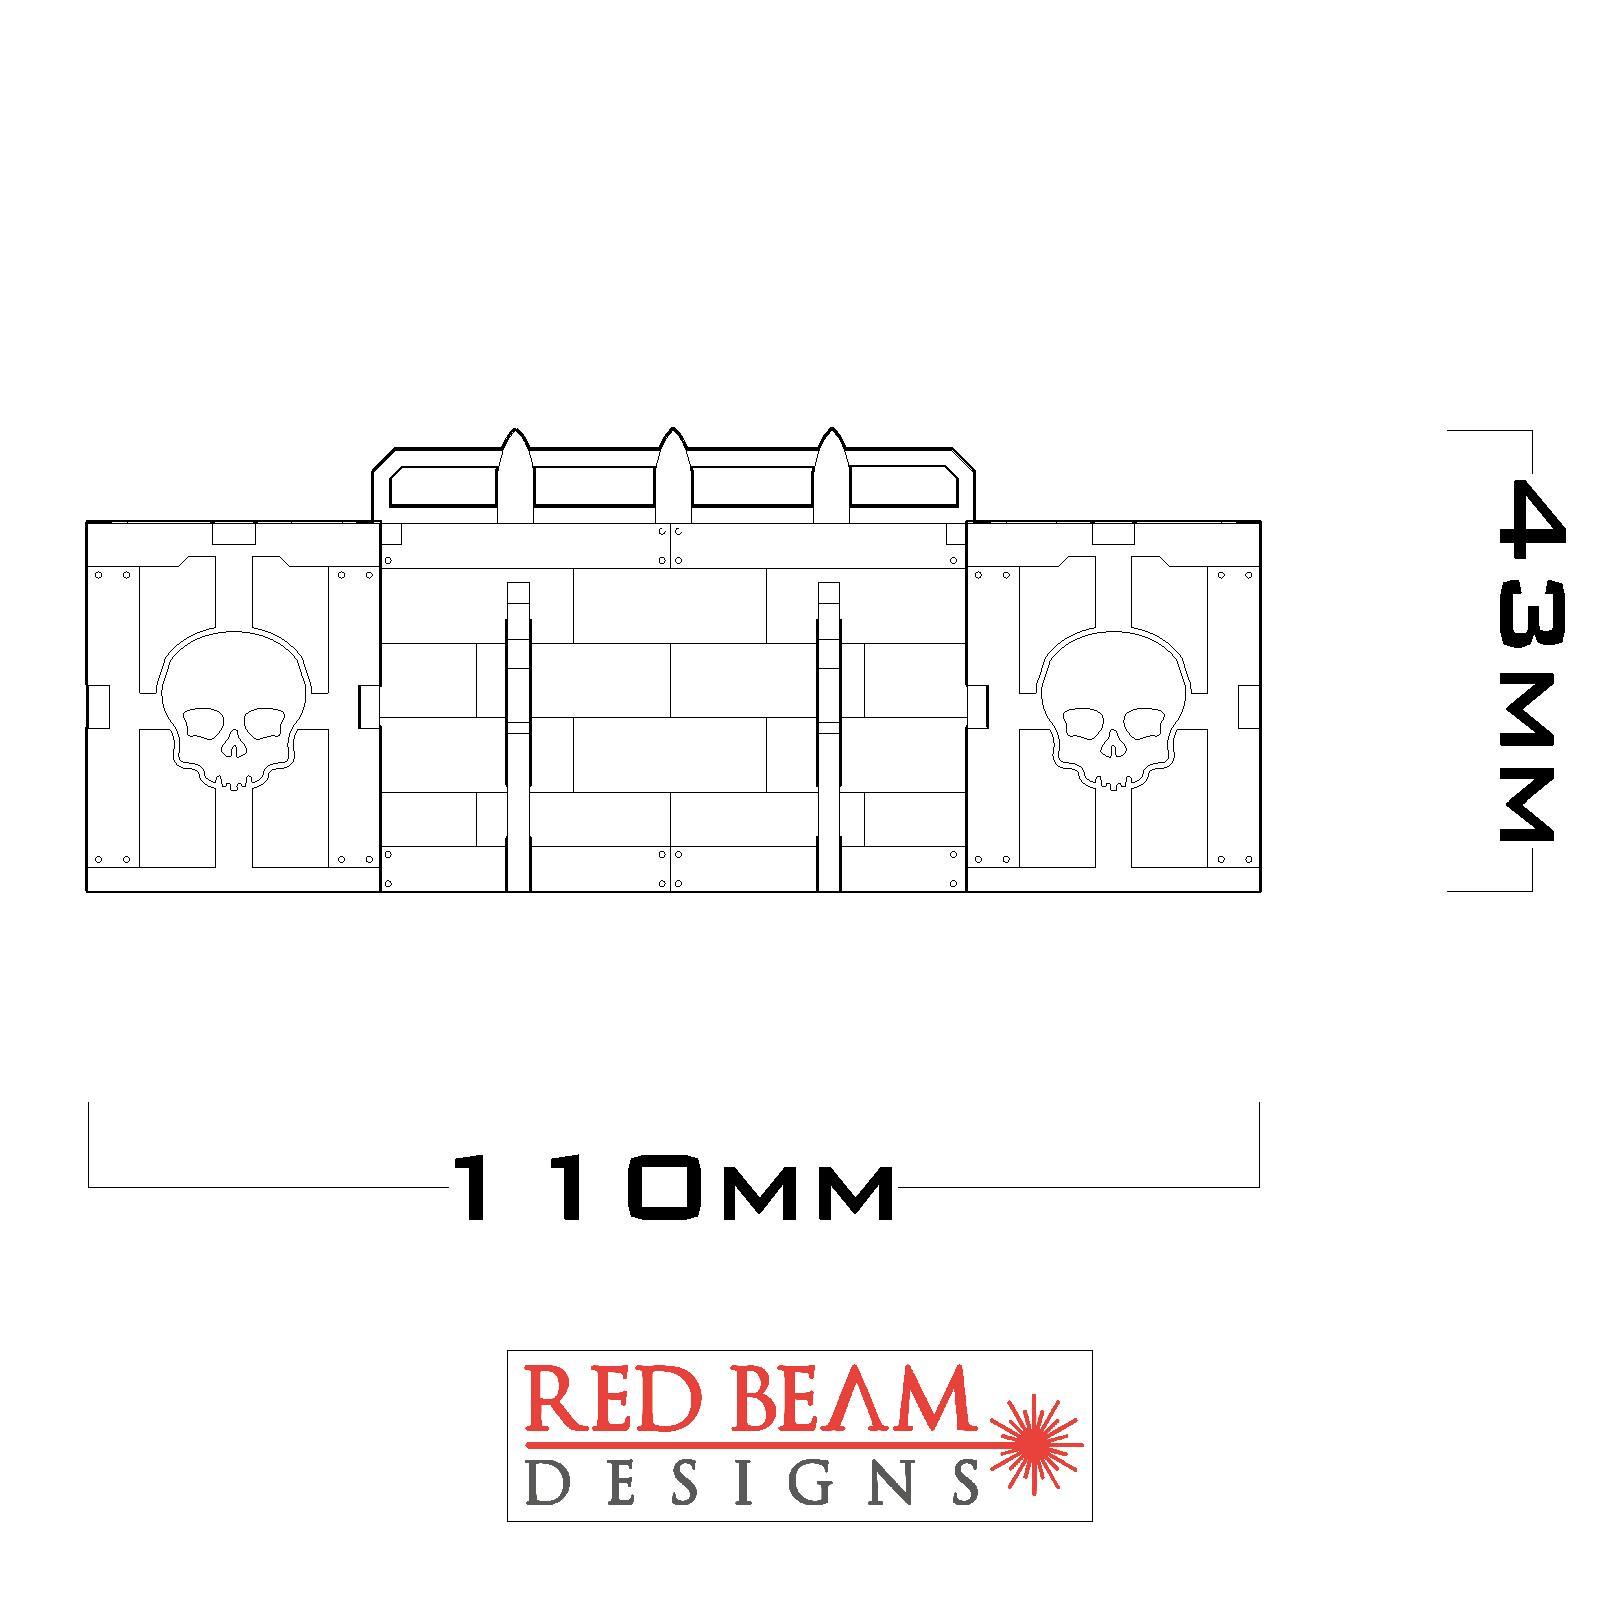 RBD091002_RENDER016.jpg